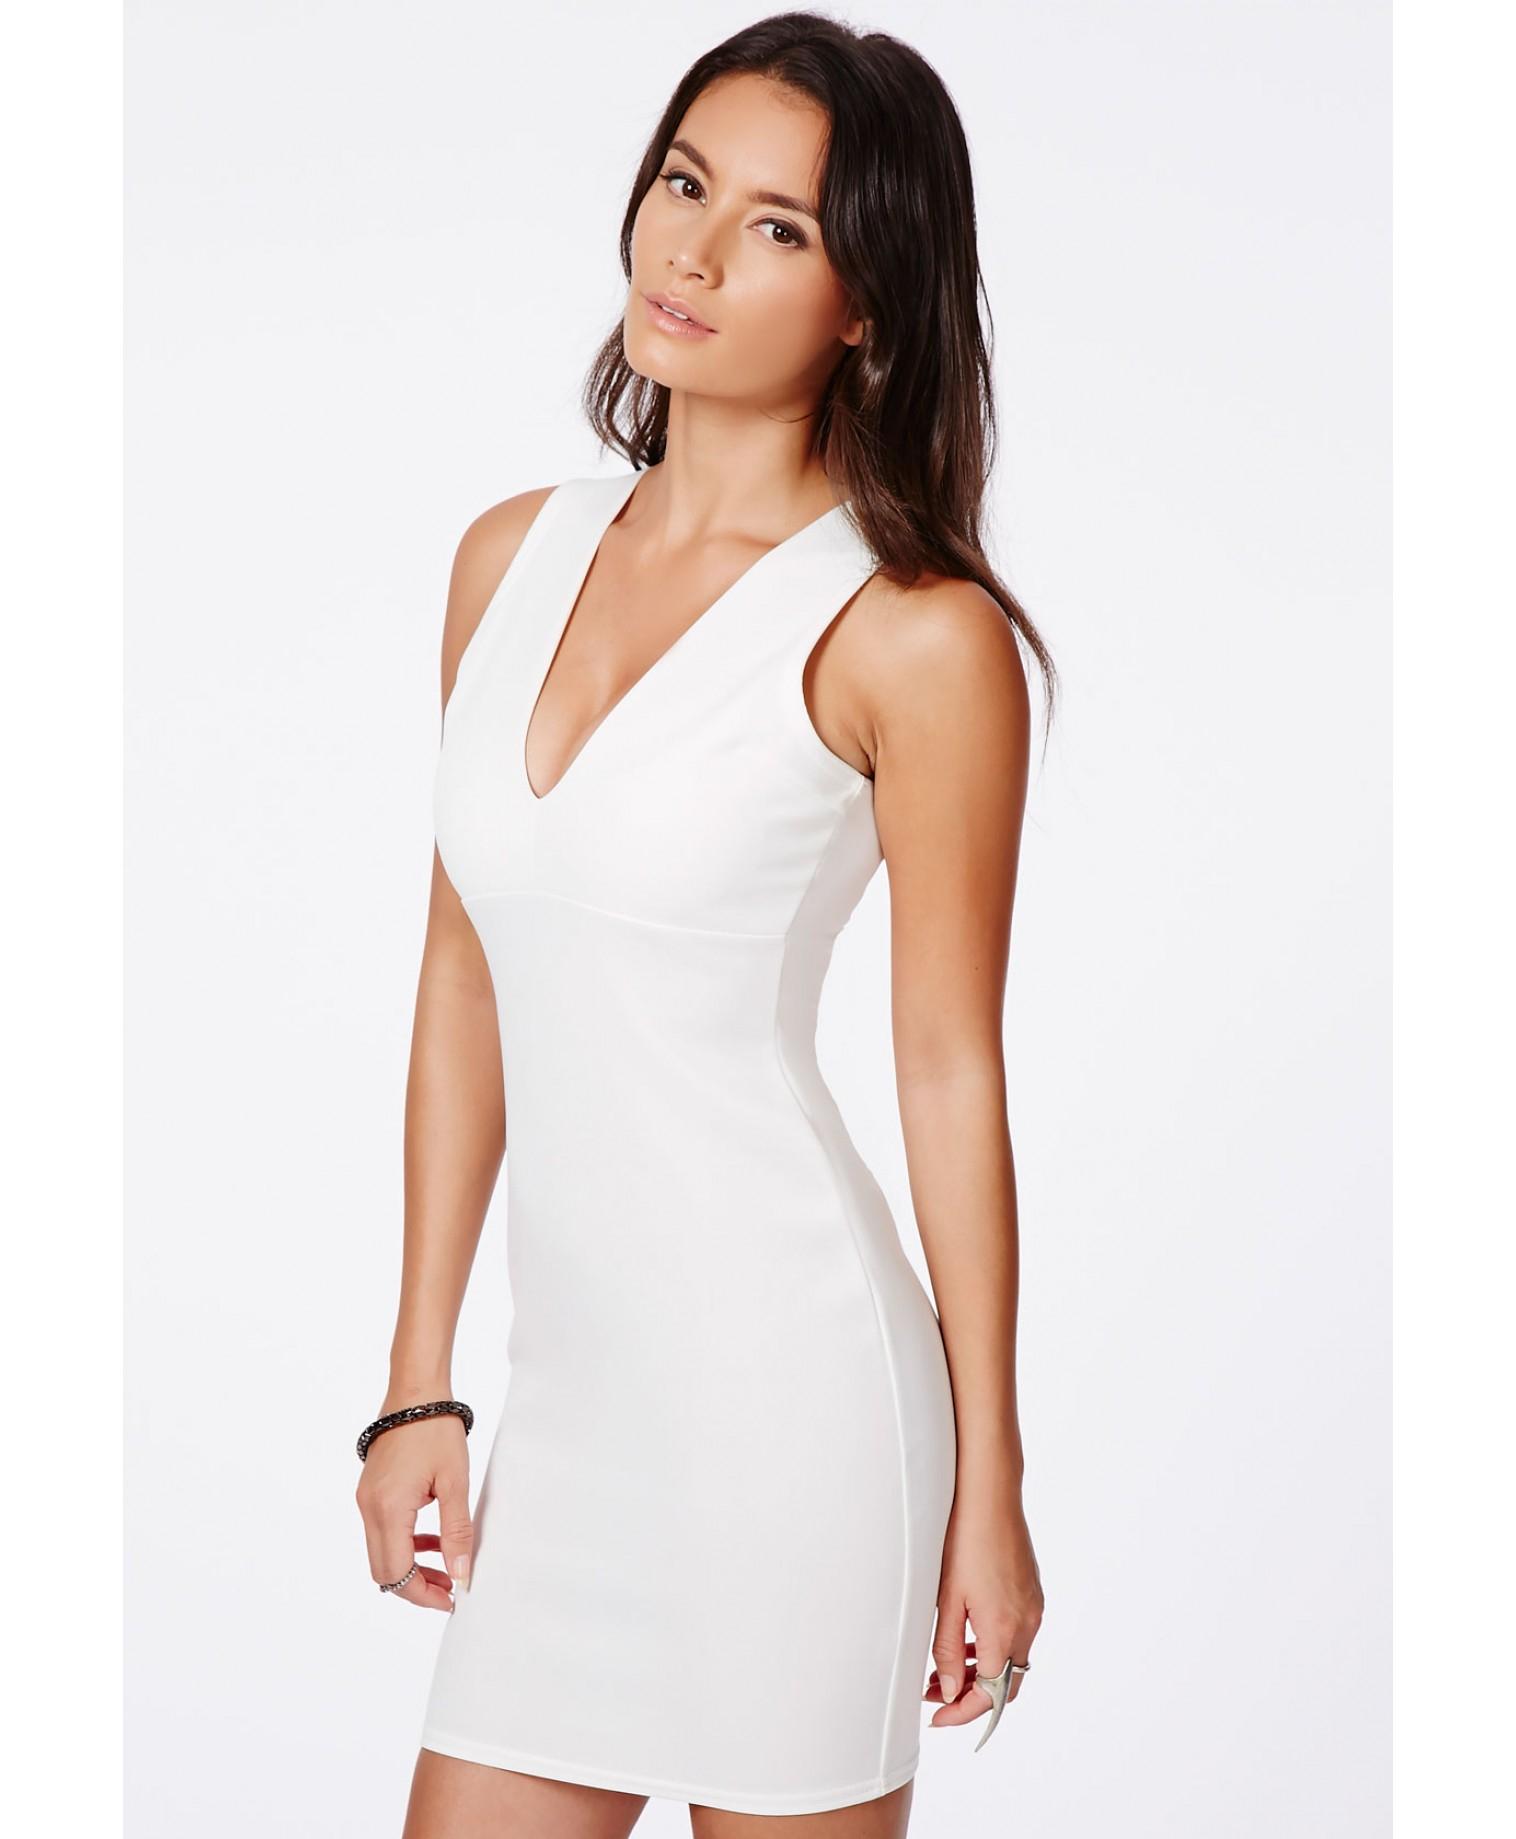 96e9b1136a22 Lyst - Missguided Kesari White Plunge Neck Bodycon Mini Dress in White